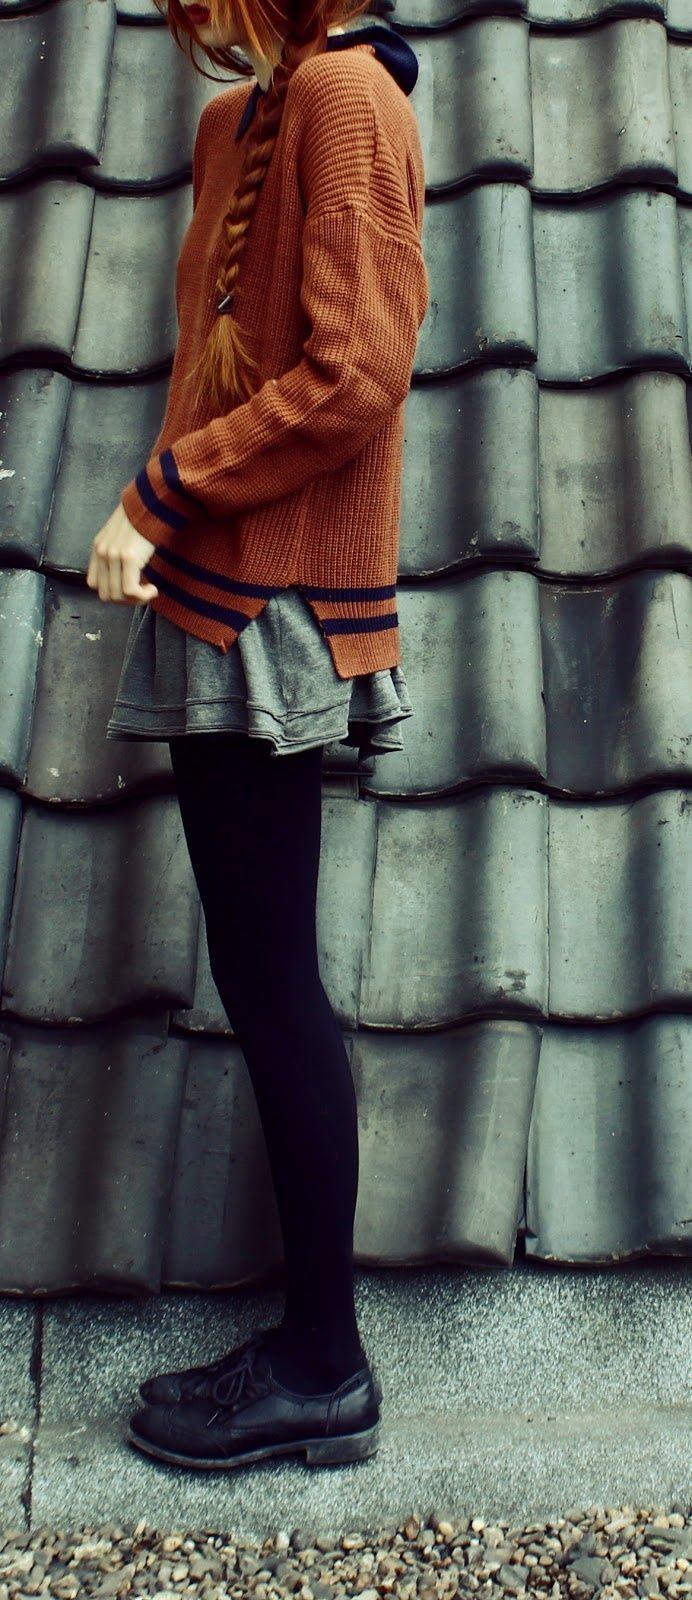 Grunge: knit sweater, skirt, black tights.